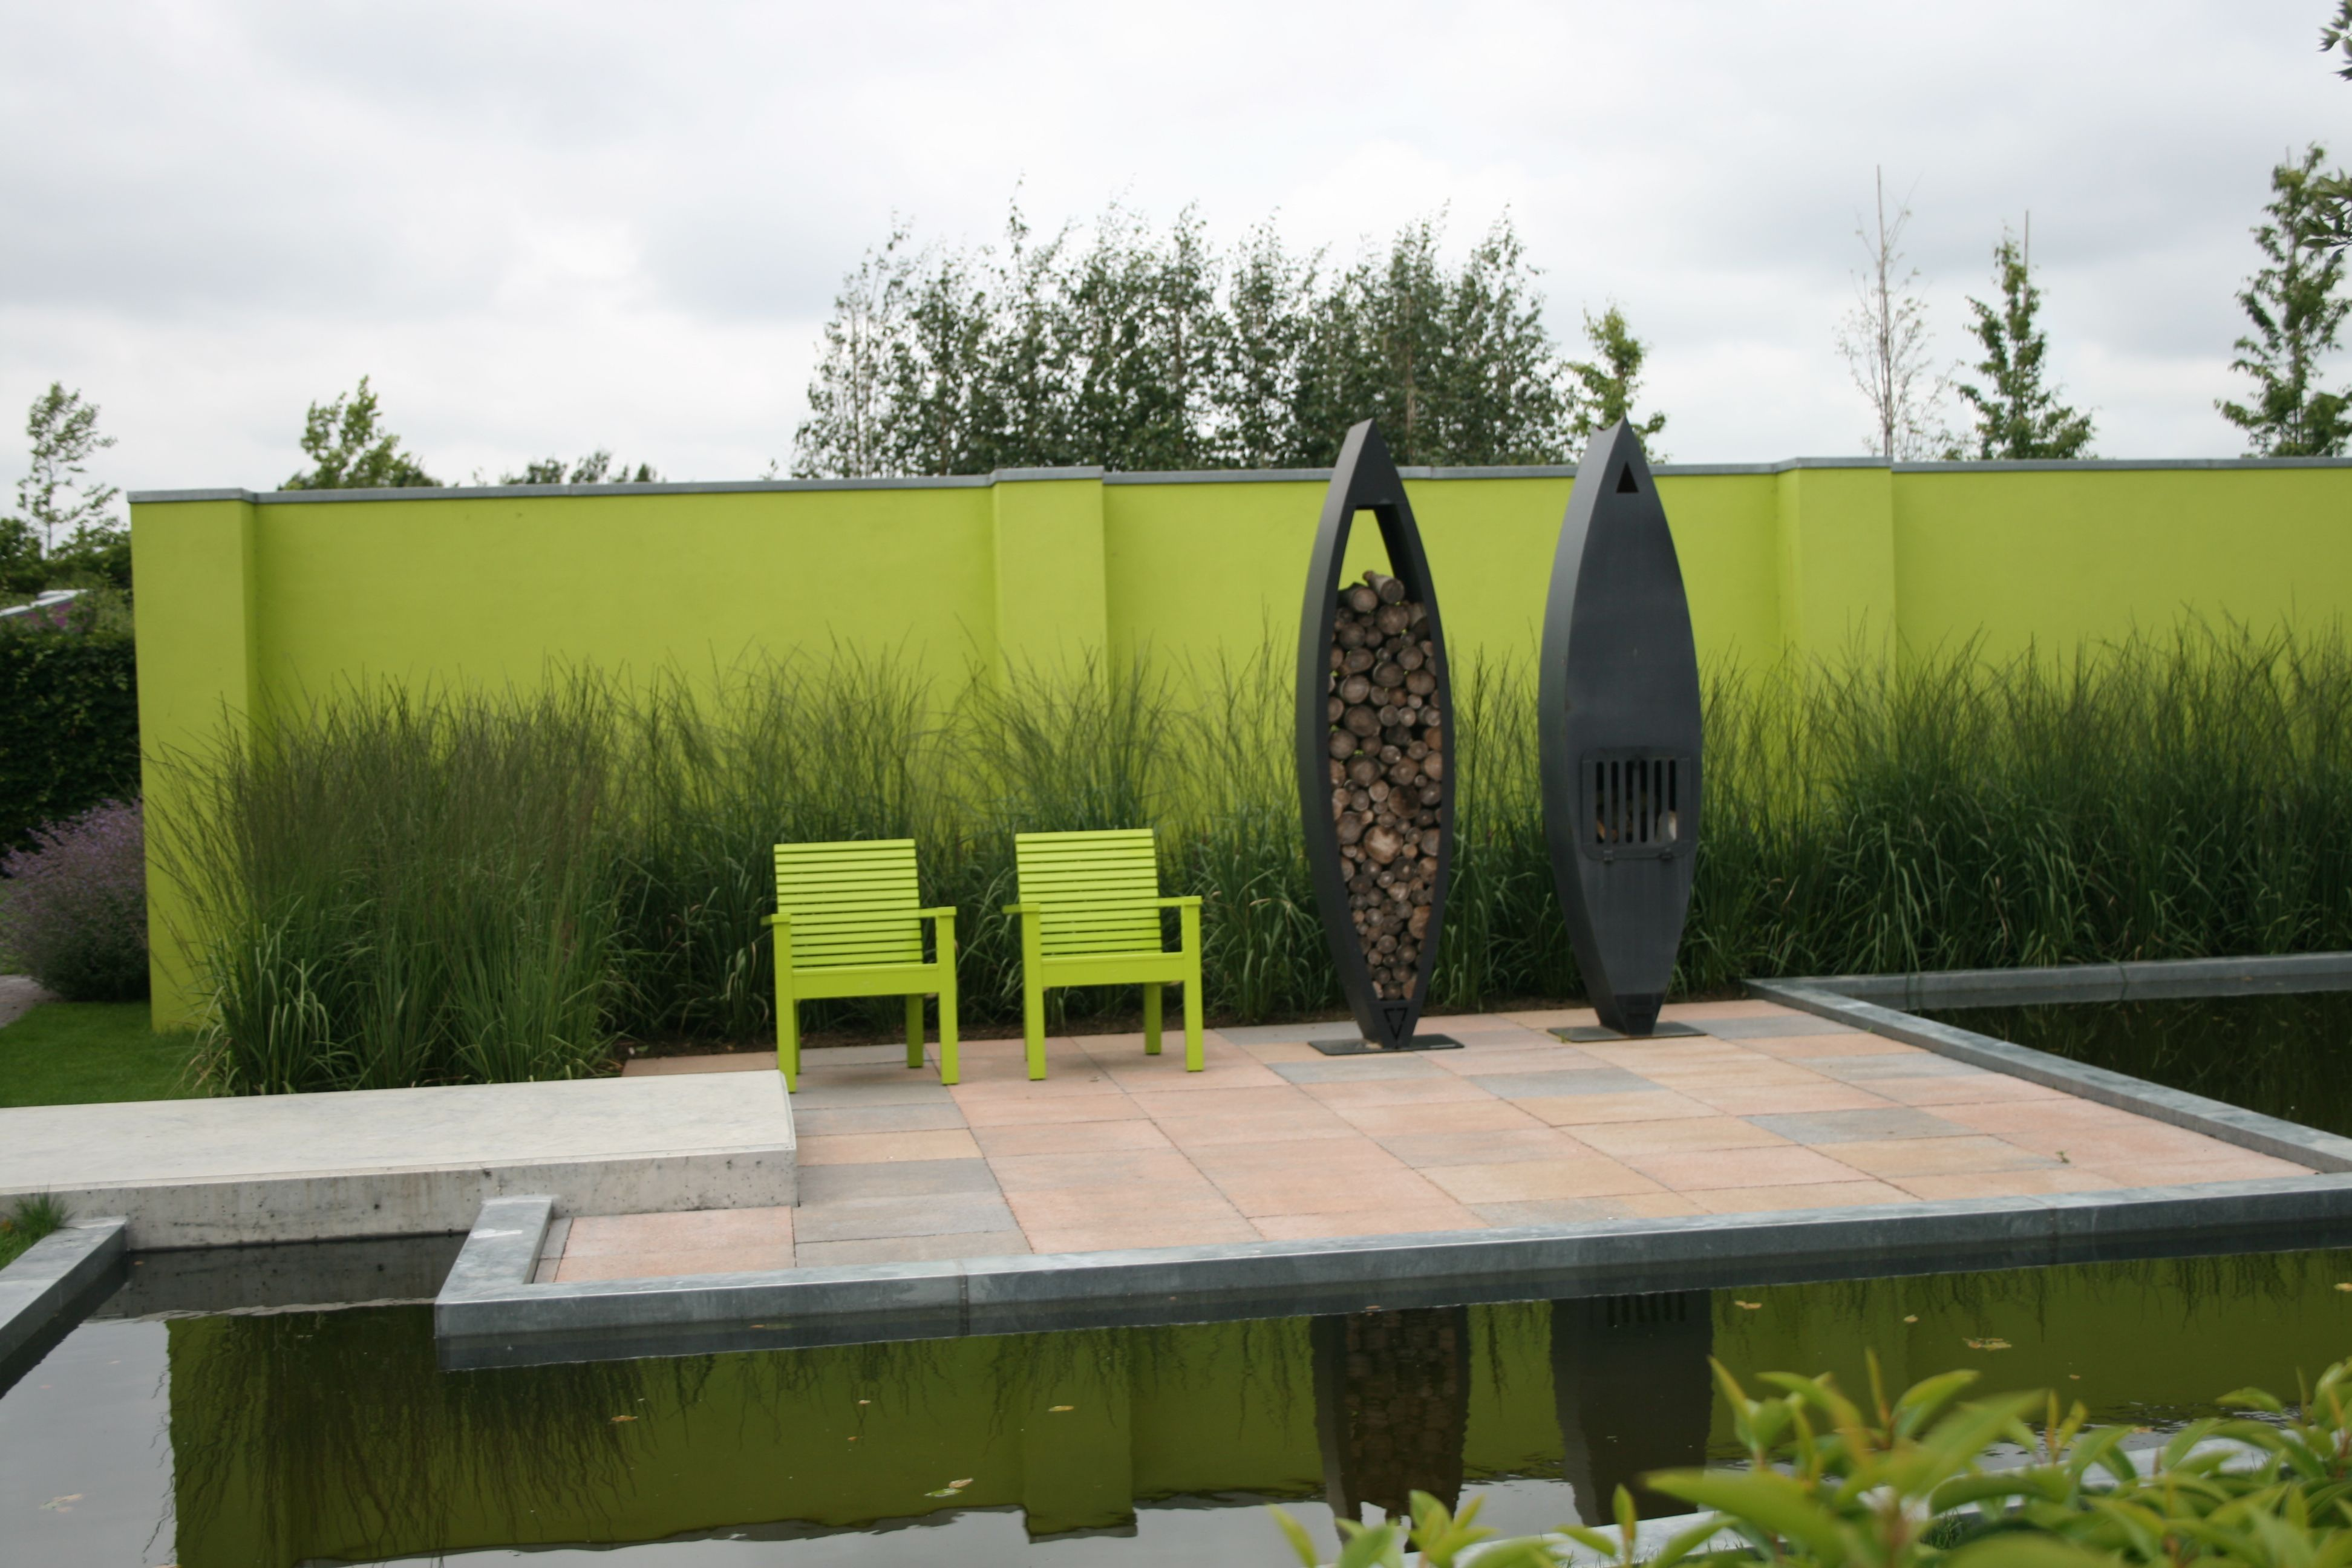 gartenreise holland/ grÄser / wasser im garten | garden, Gartengerate ideen